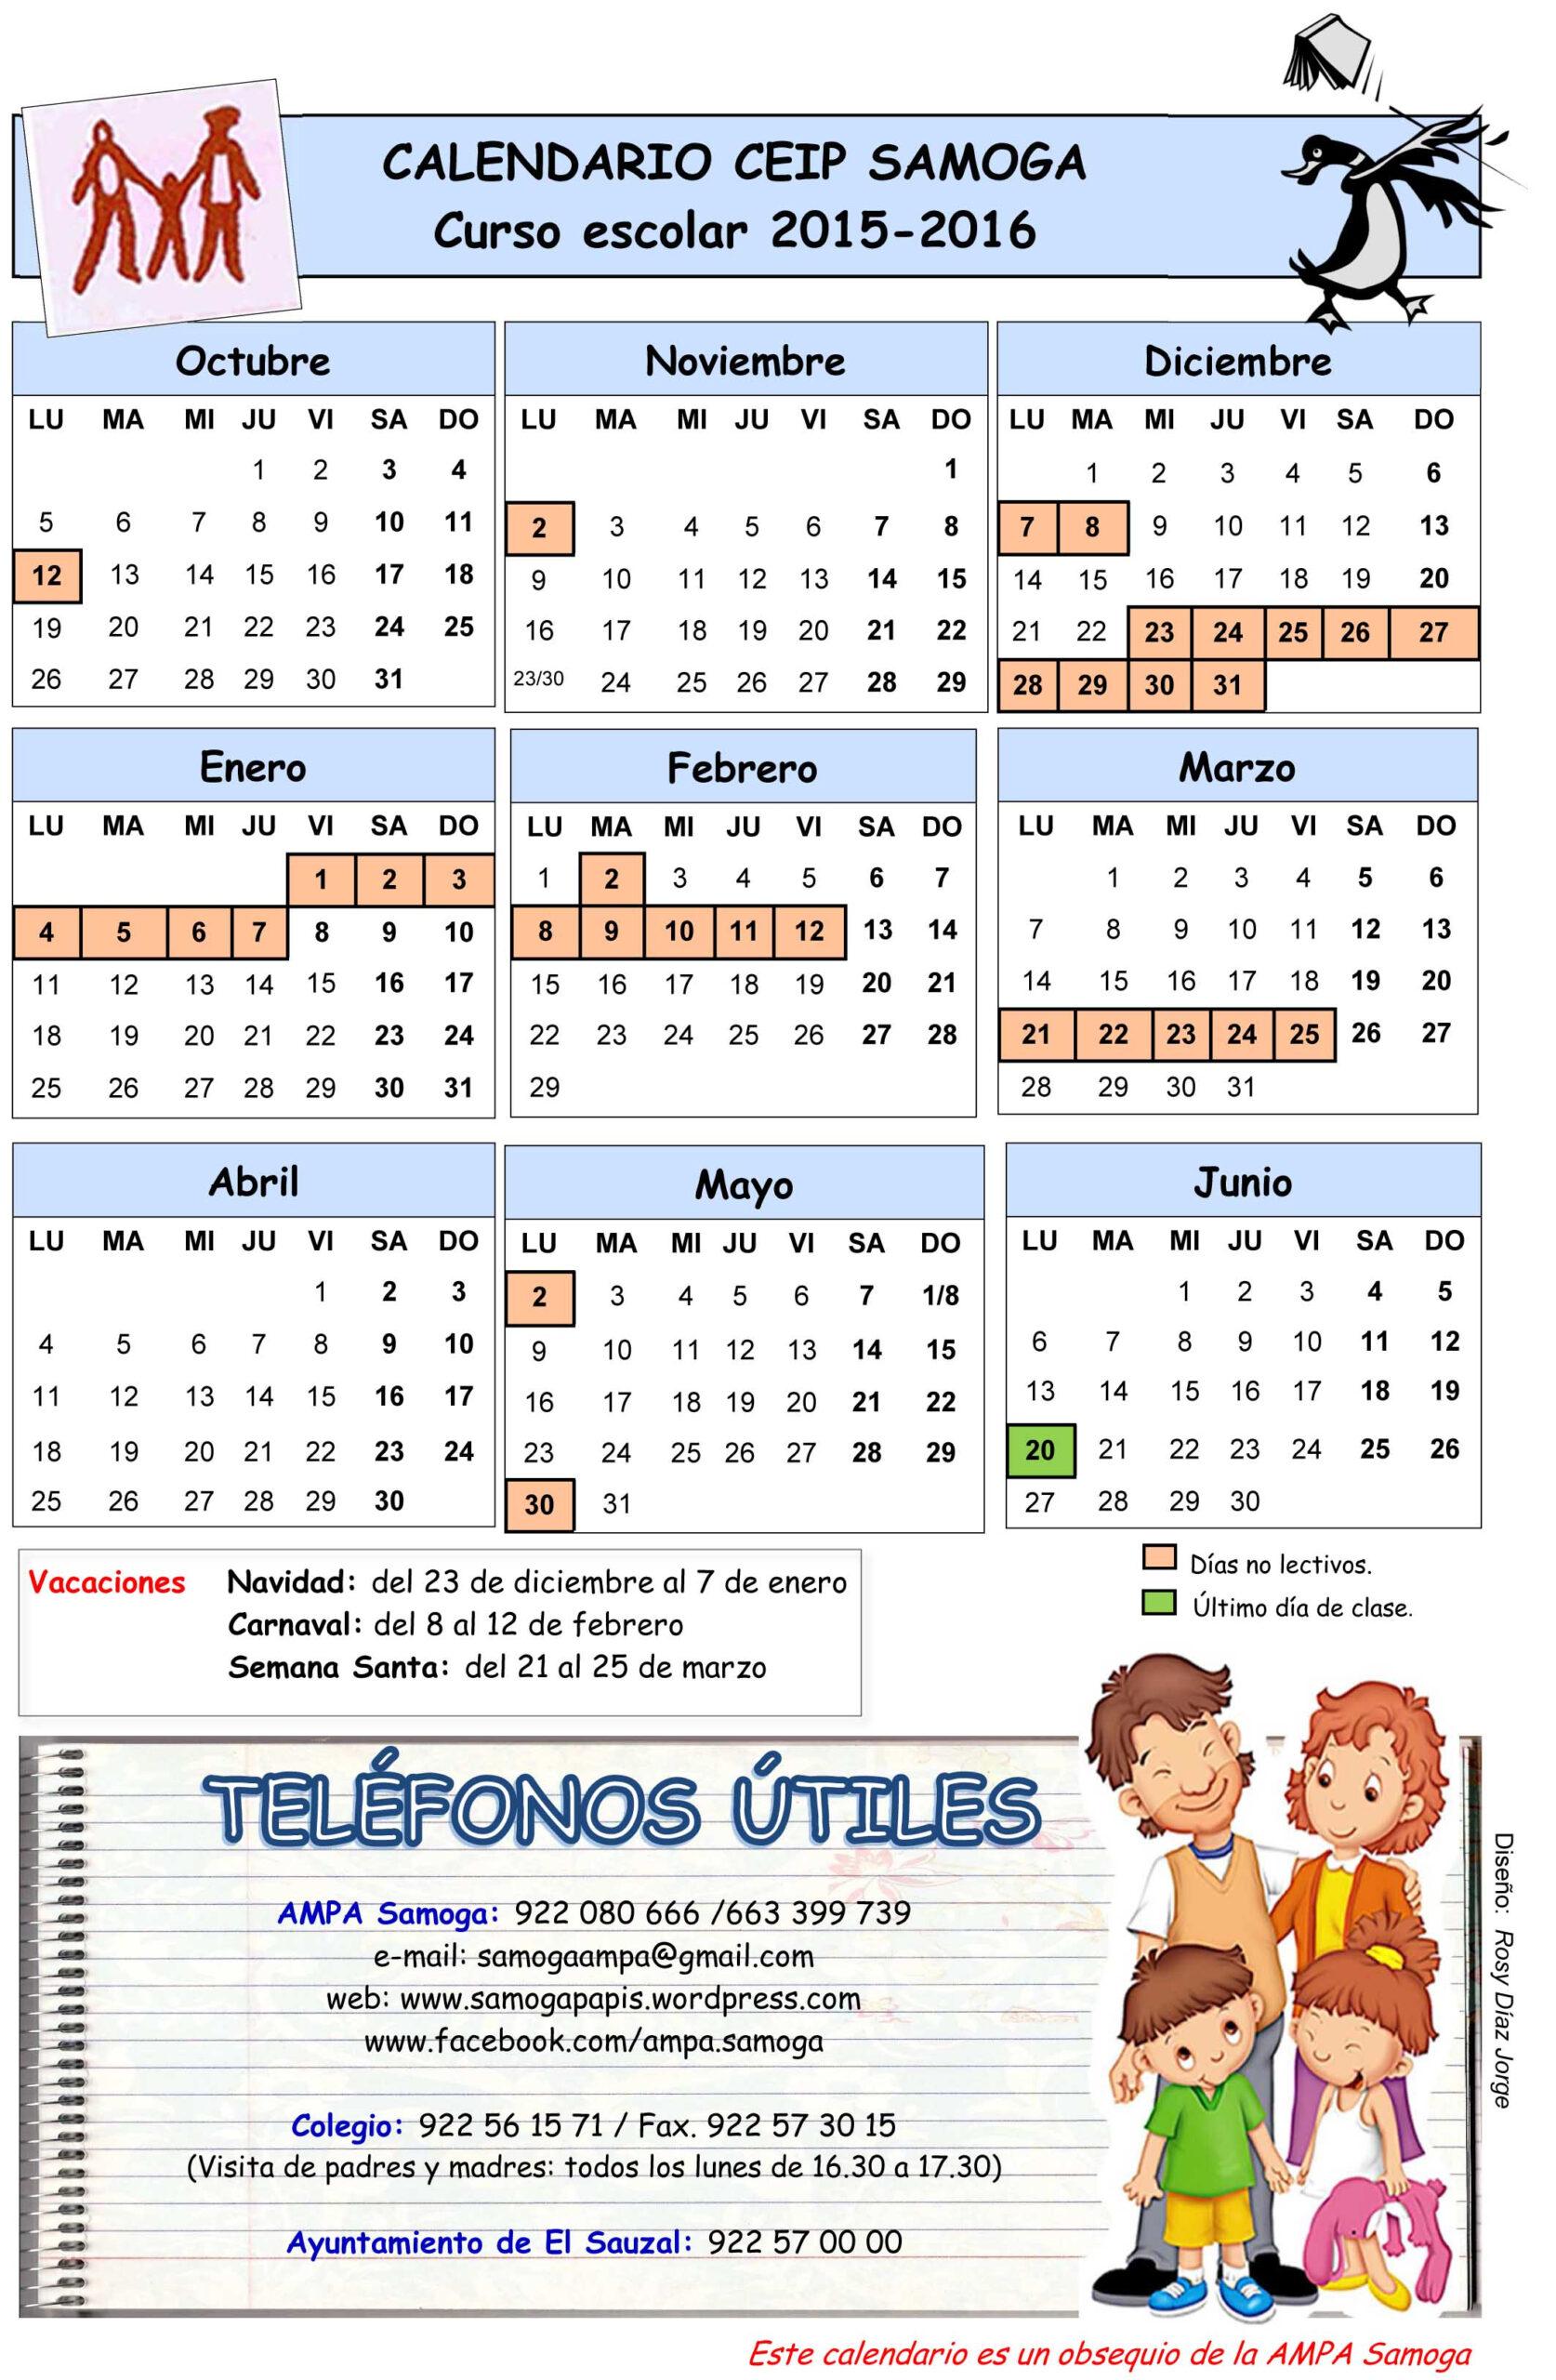 Calendario Escolar 2015/2016 Del Colegio Samoga | Ampa inside Calendario Escolar WordPress